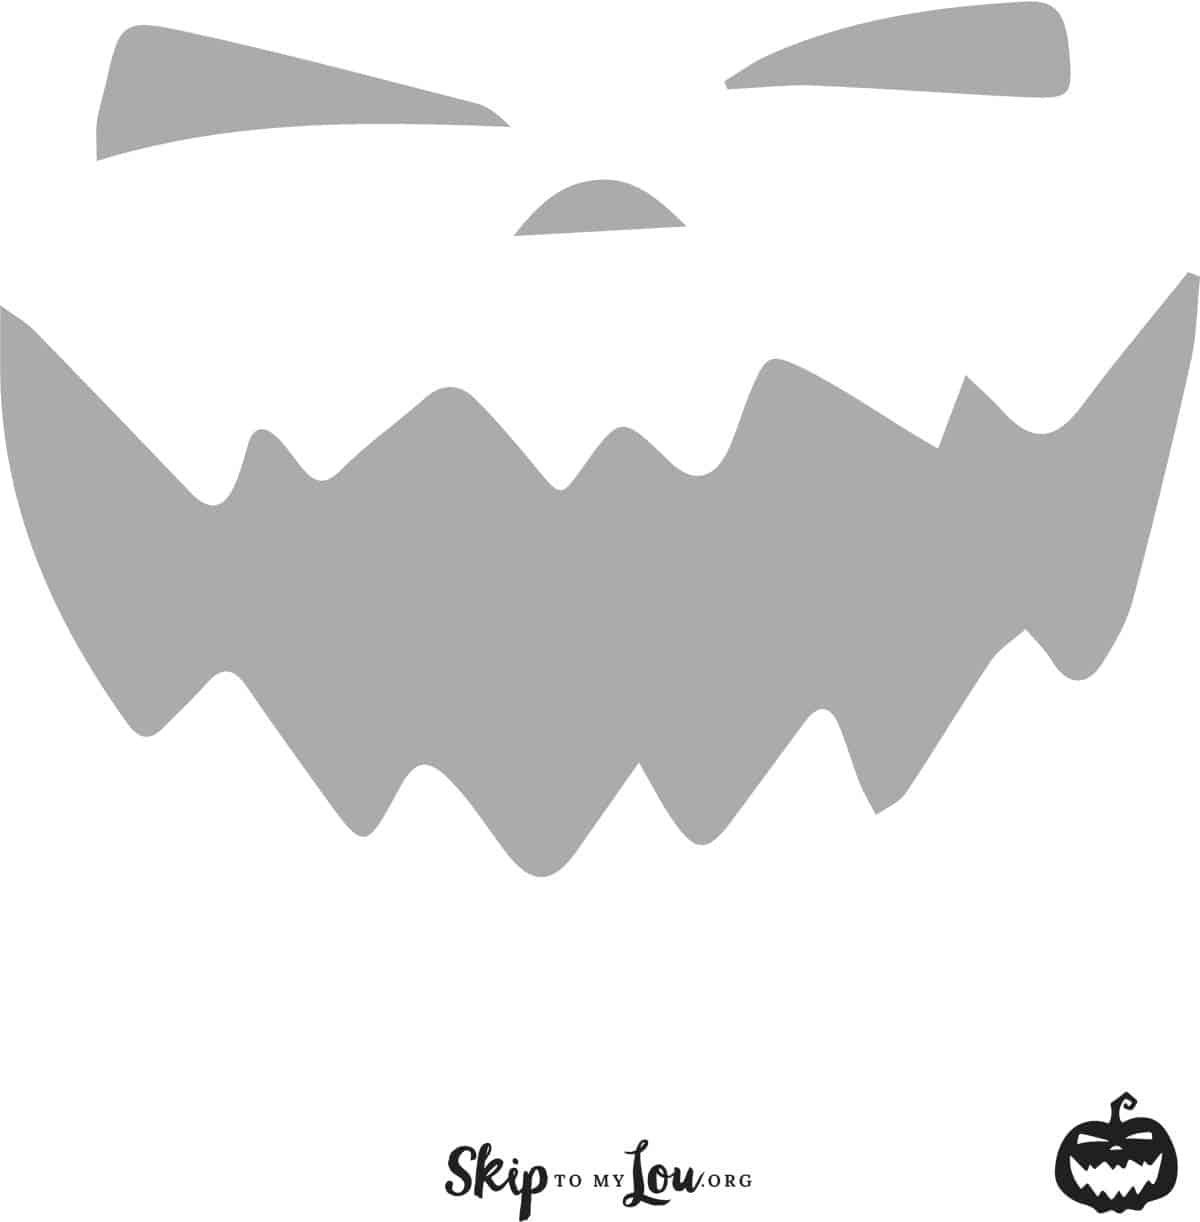 Cool Free Printable Pumpkin Carving Stencils - Skip To My Lou - Free Printable Pumpkin Faces